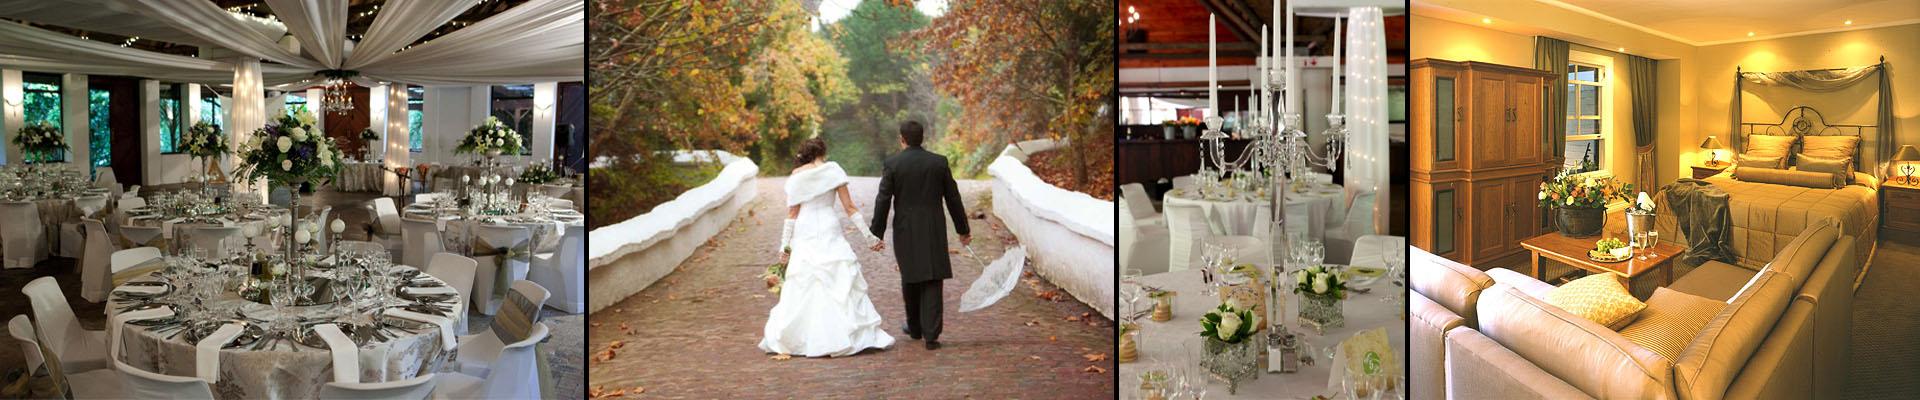 Weddings and Banqueting